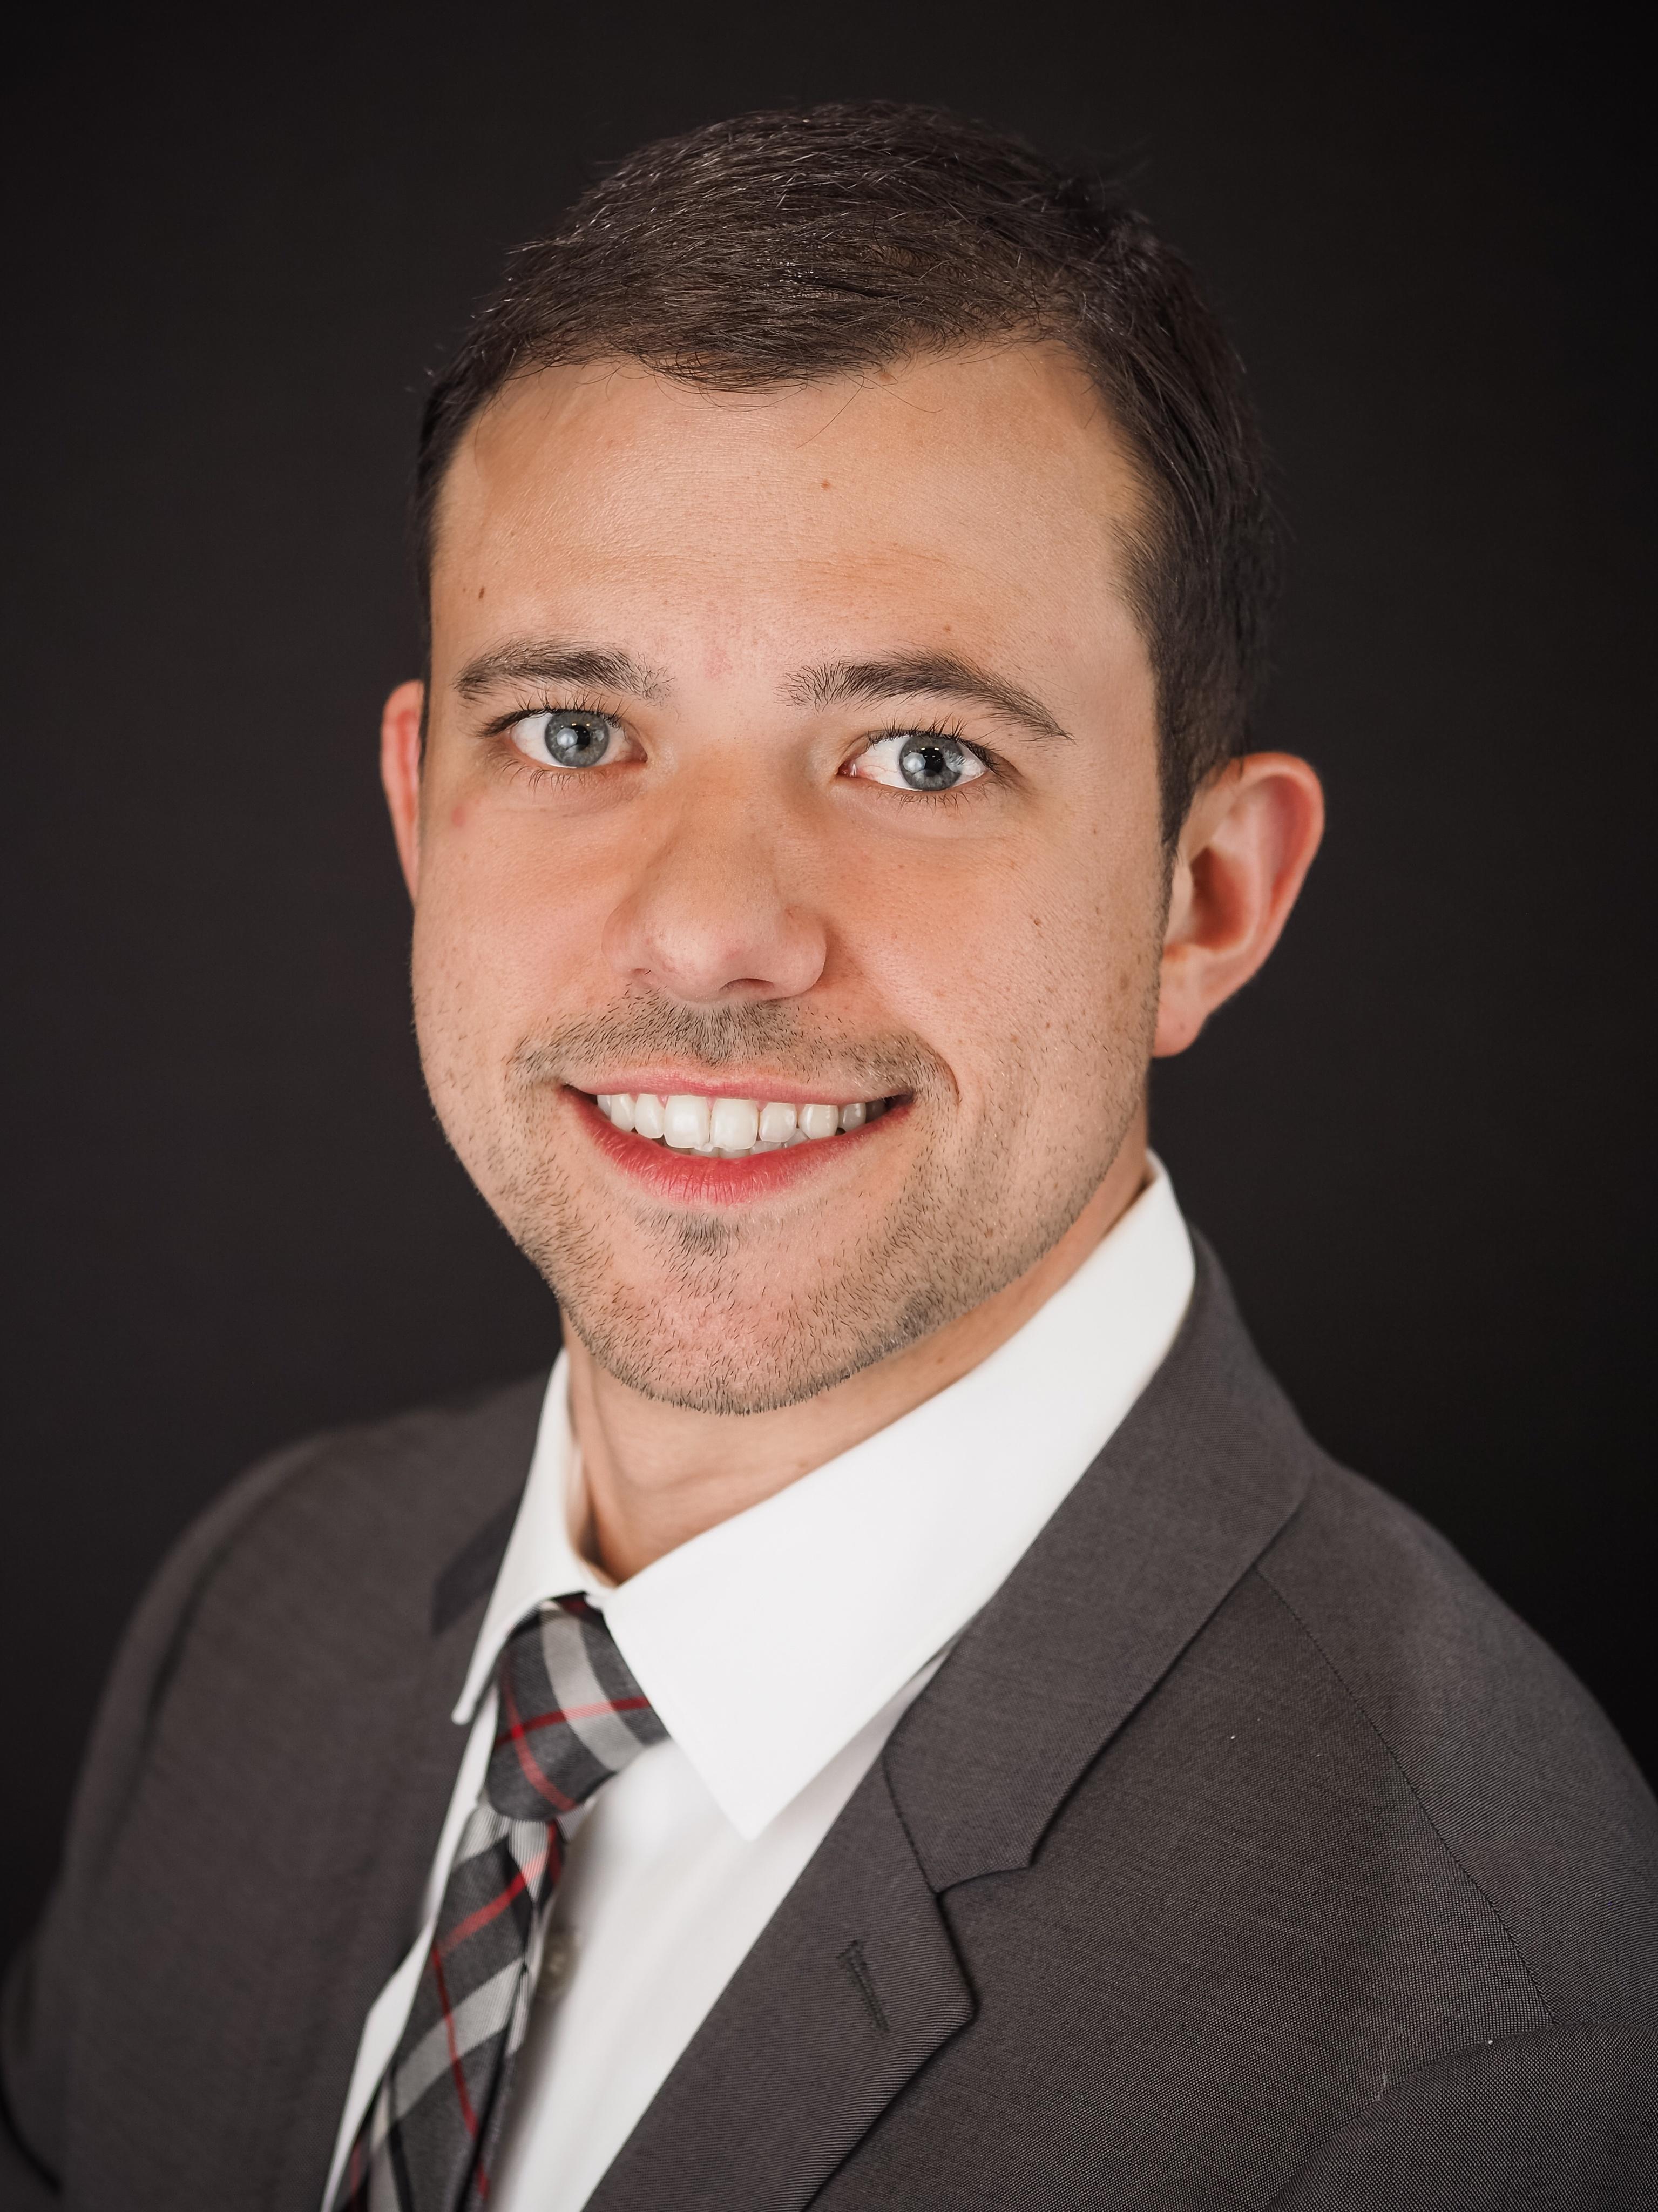 Lane Welcomes Podiatrist Kyle Lindow